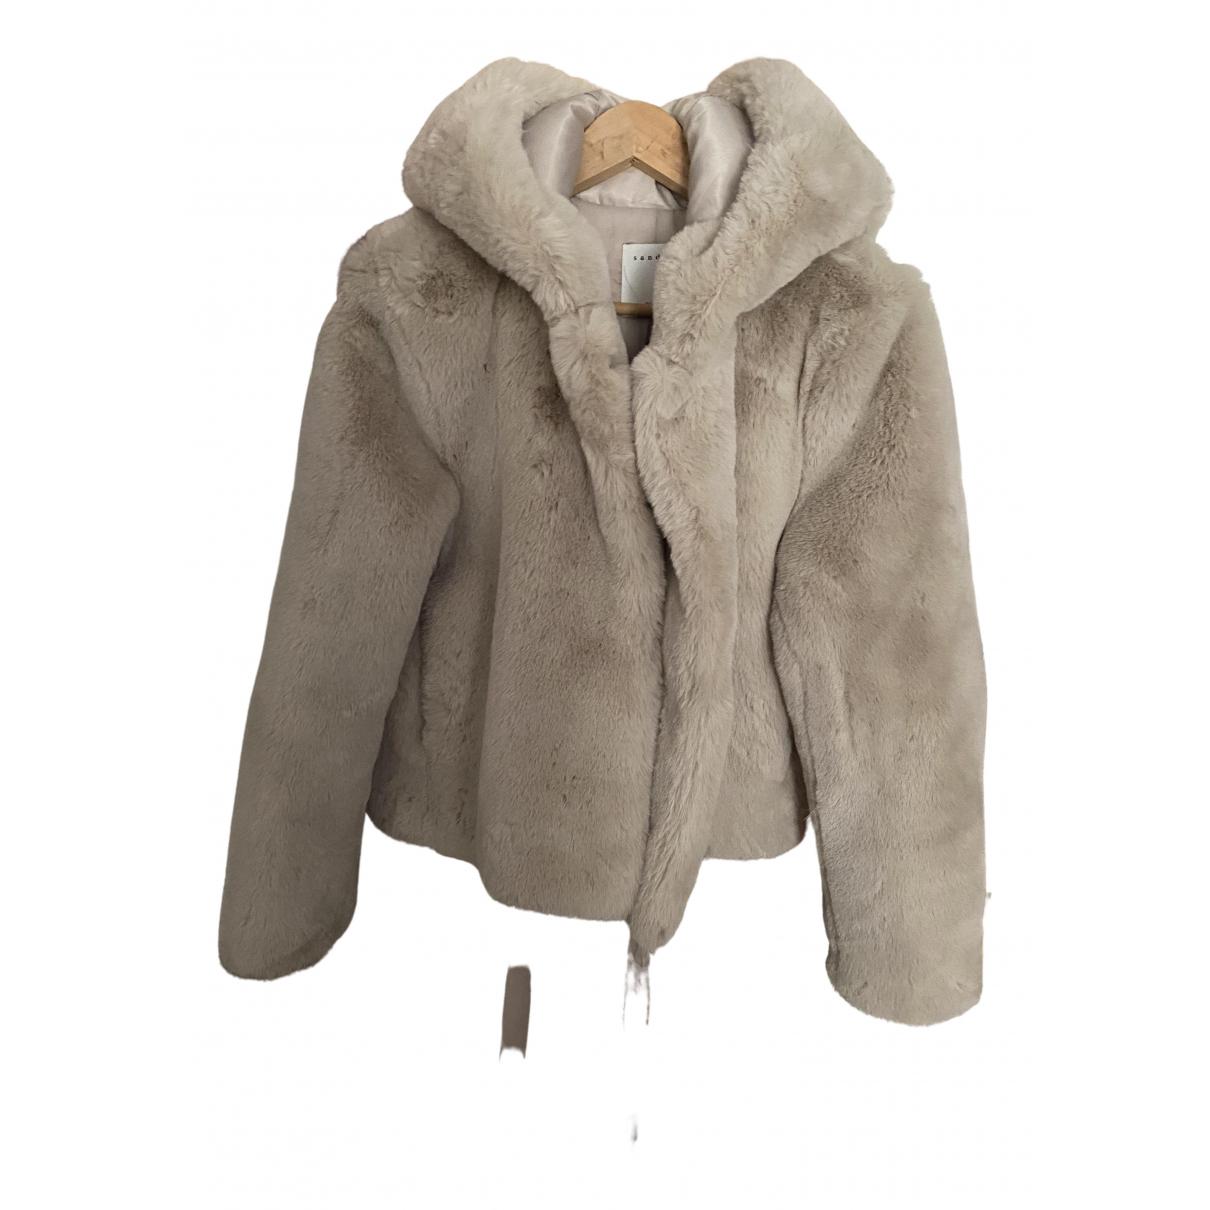 Sandro Fall Winter 2019 Ecru Faux fur coat for Women 40 FR